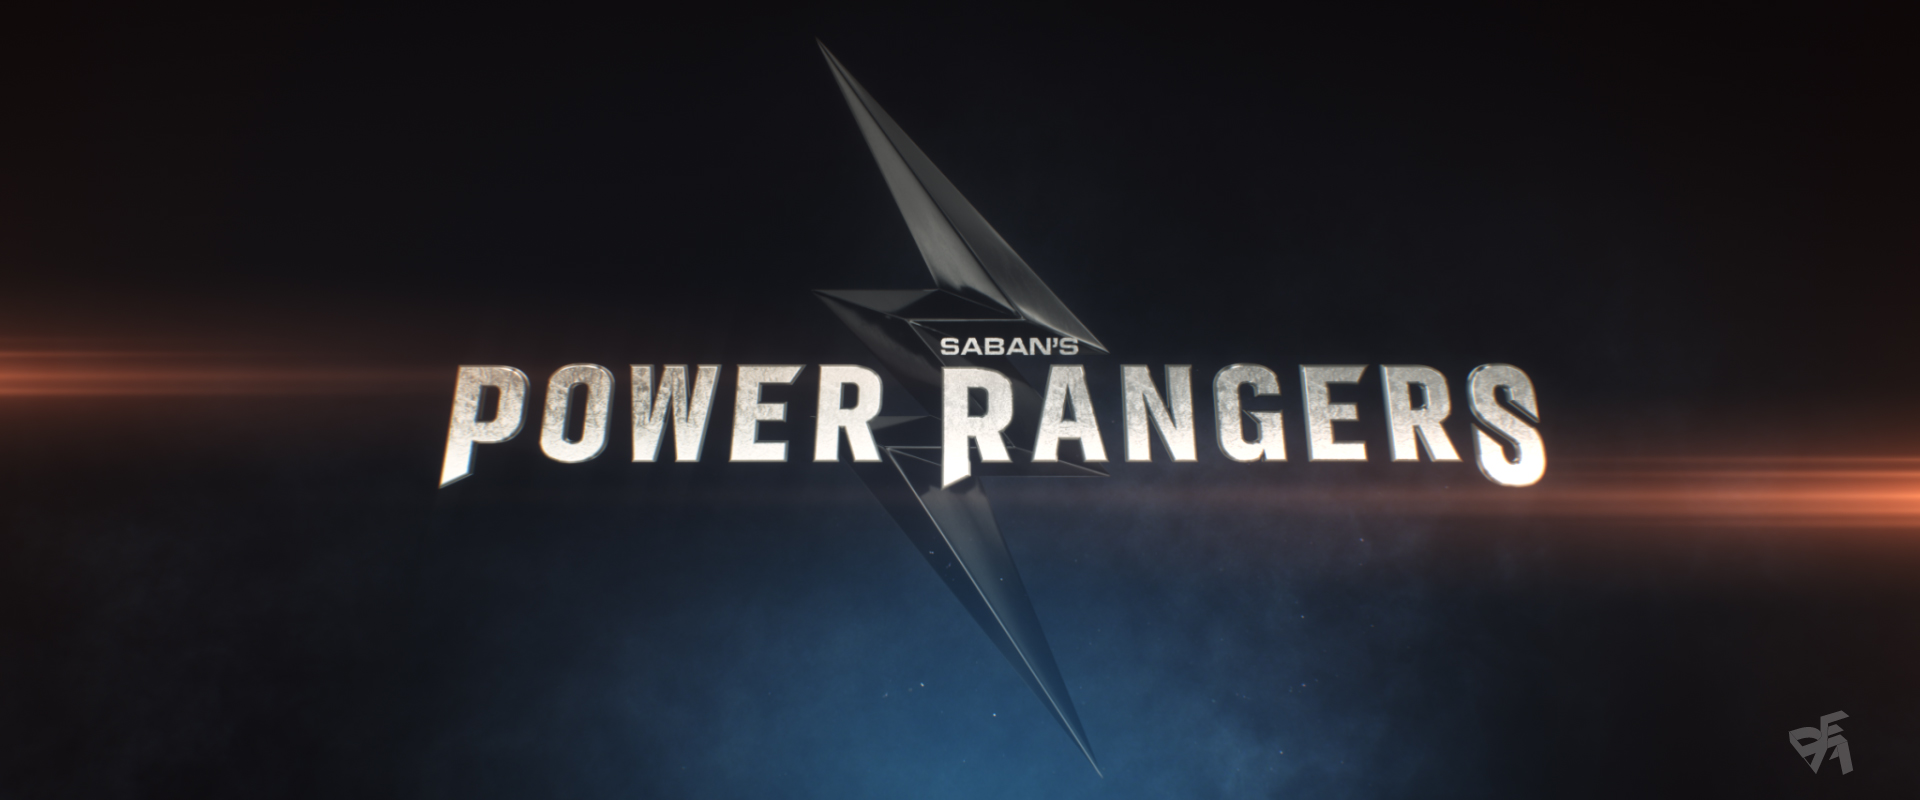 PowerRangers_STYLEFRAME_01.jpg